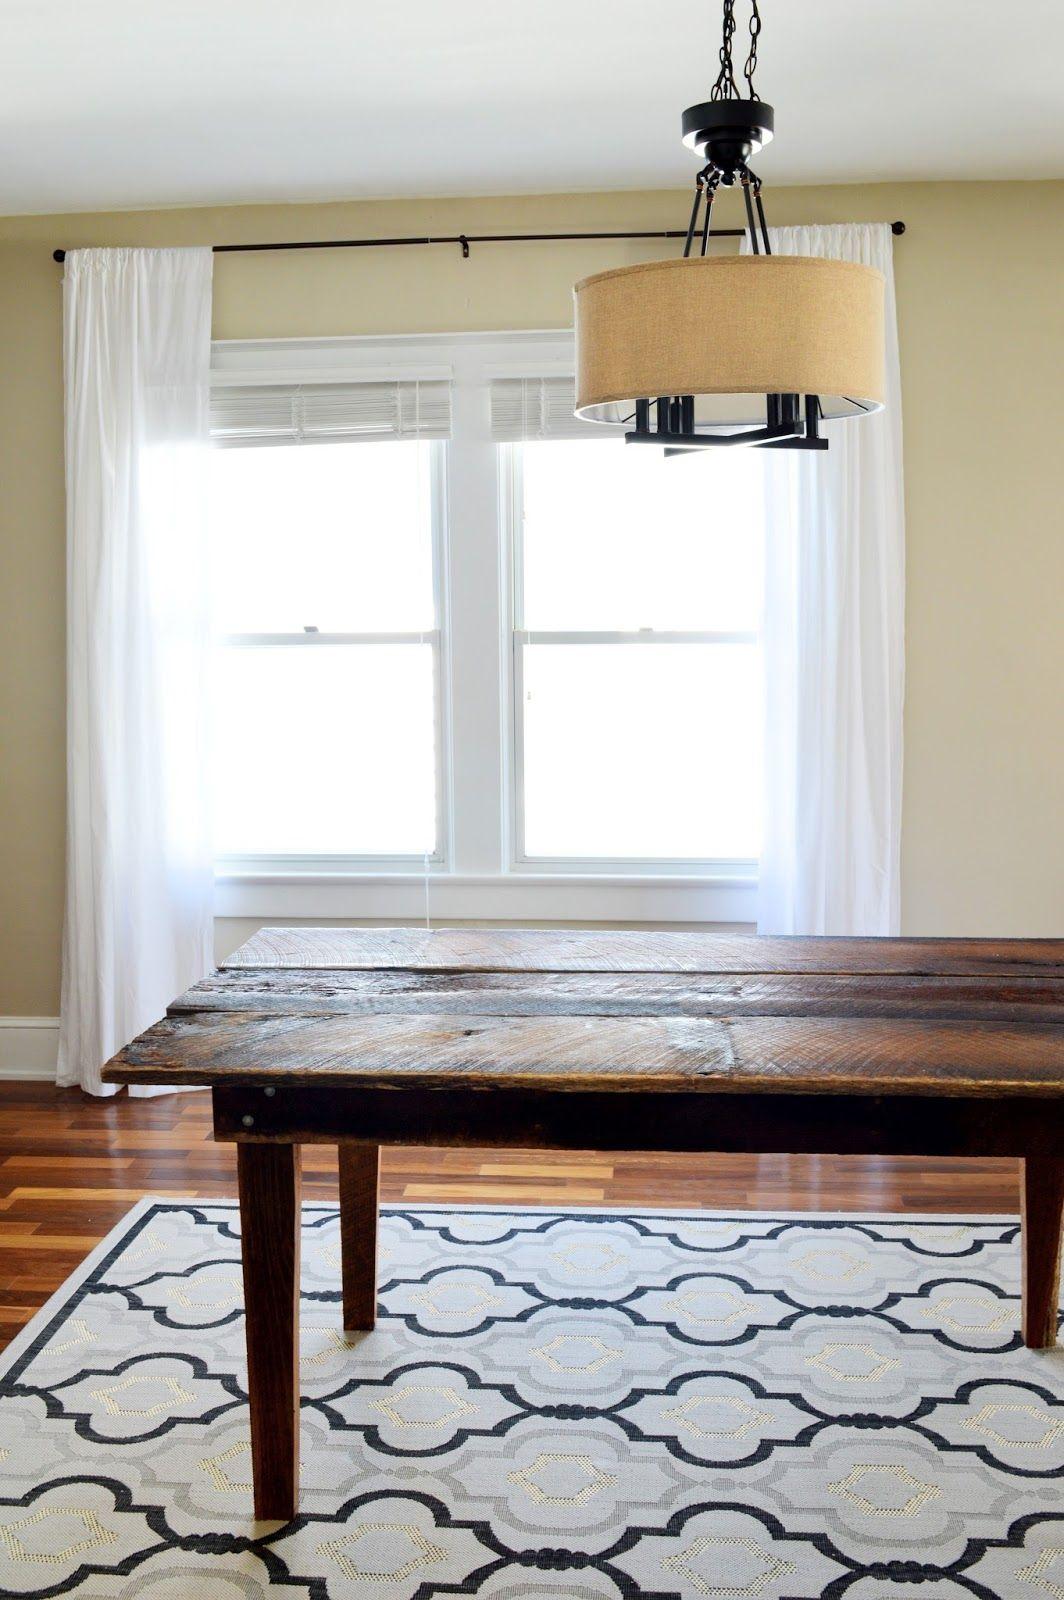 724 South House | From Farmhouse to Our House: Dining Room Table | Farmhouse Table | Ballard Designs Trellis Rug